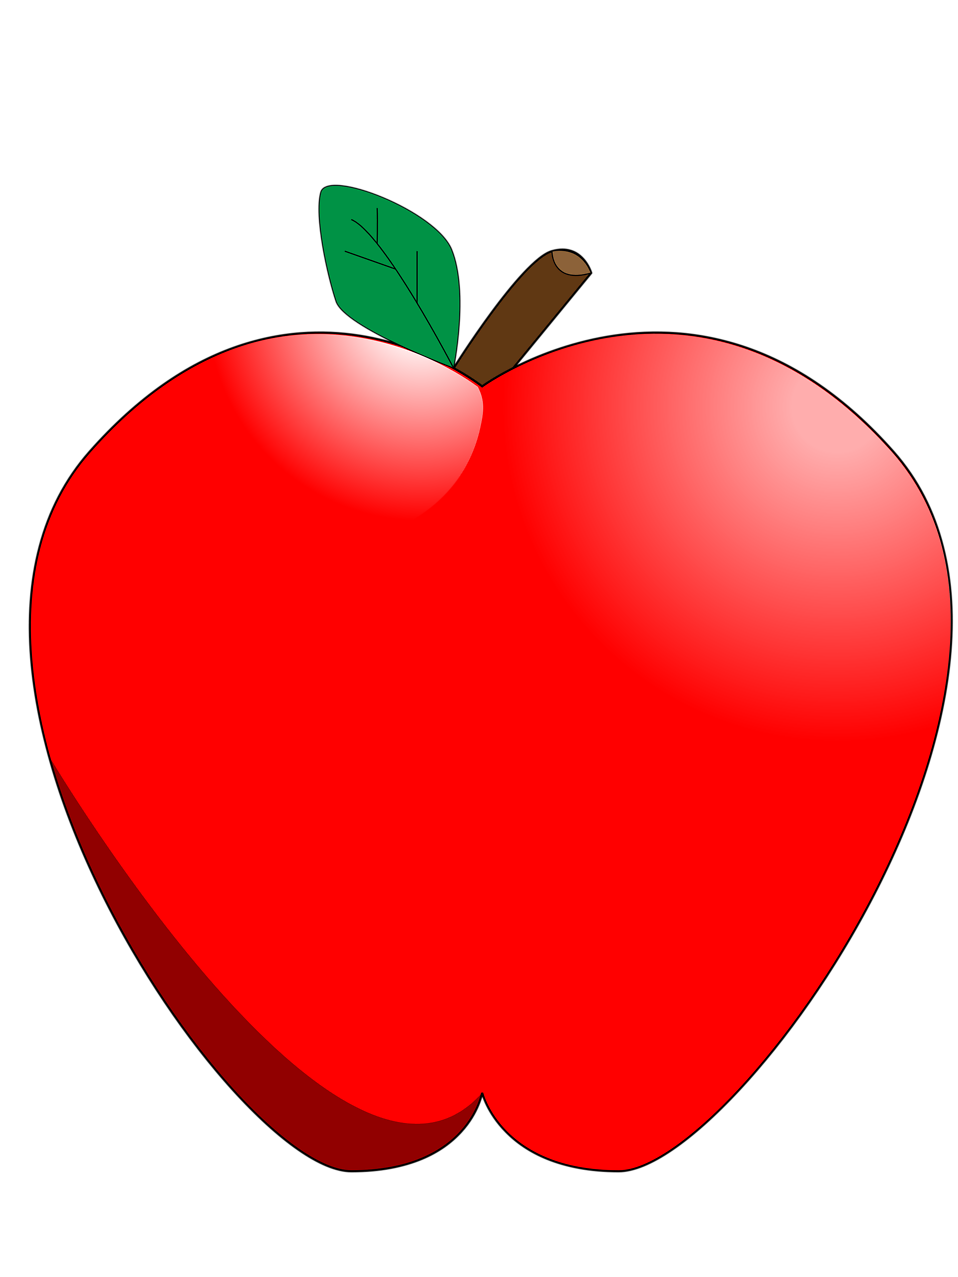 Apple border clipart landscape clip art transparent Apple | Free Stock Photo | Illustration of a red apple | # 11460 clip art transparent